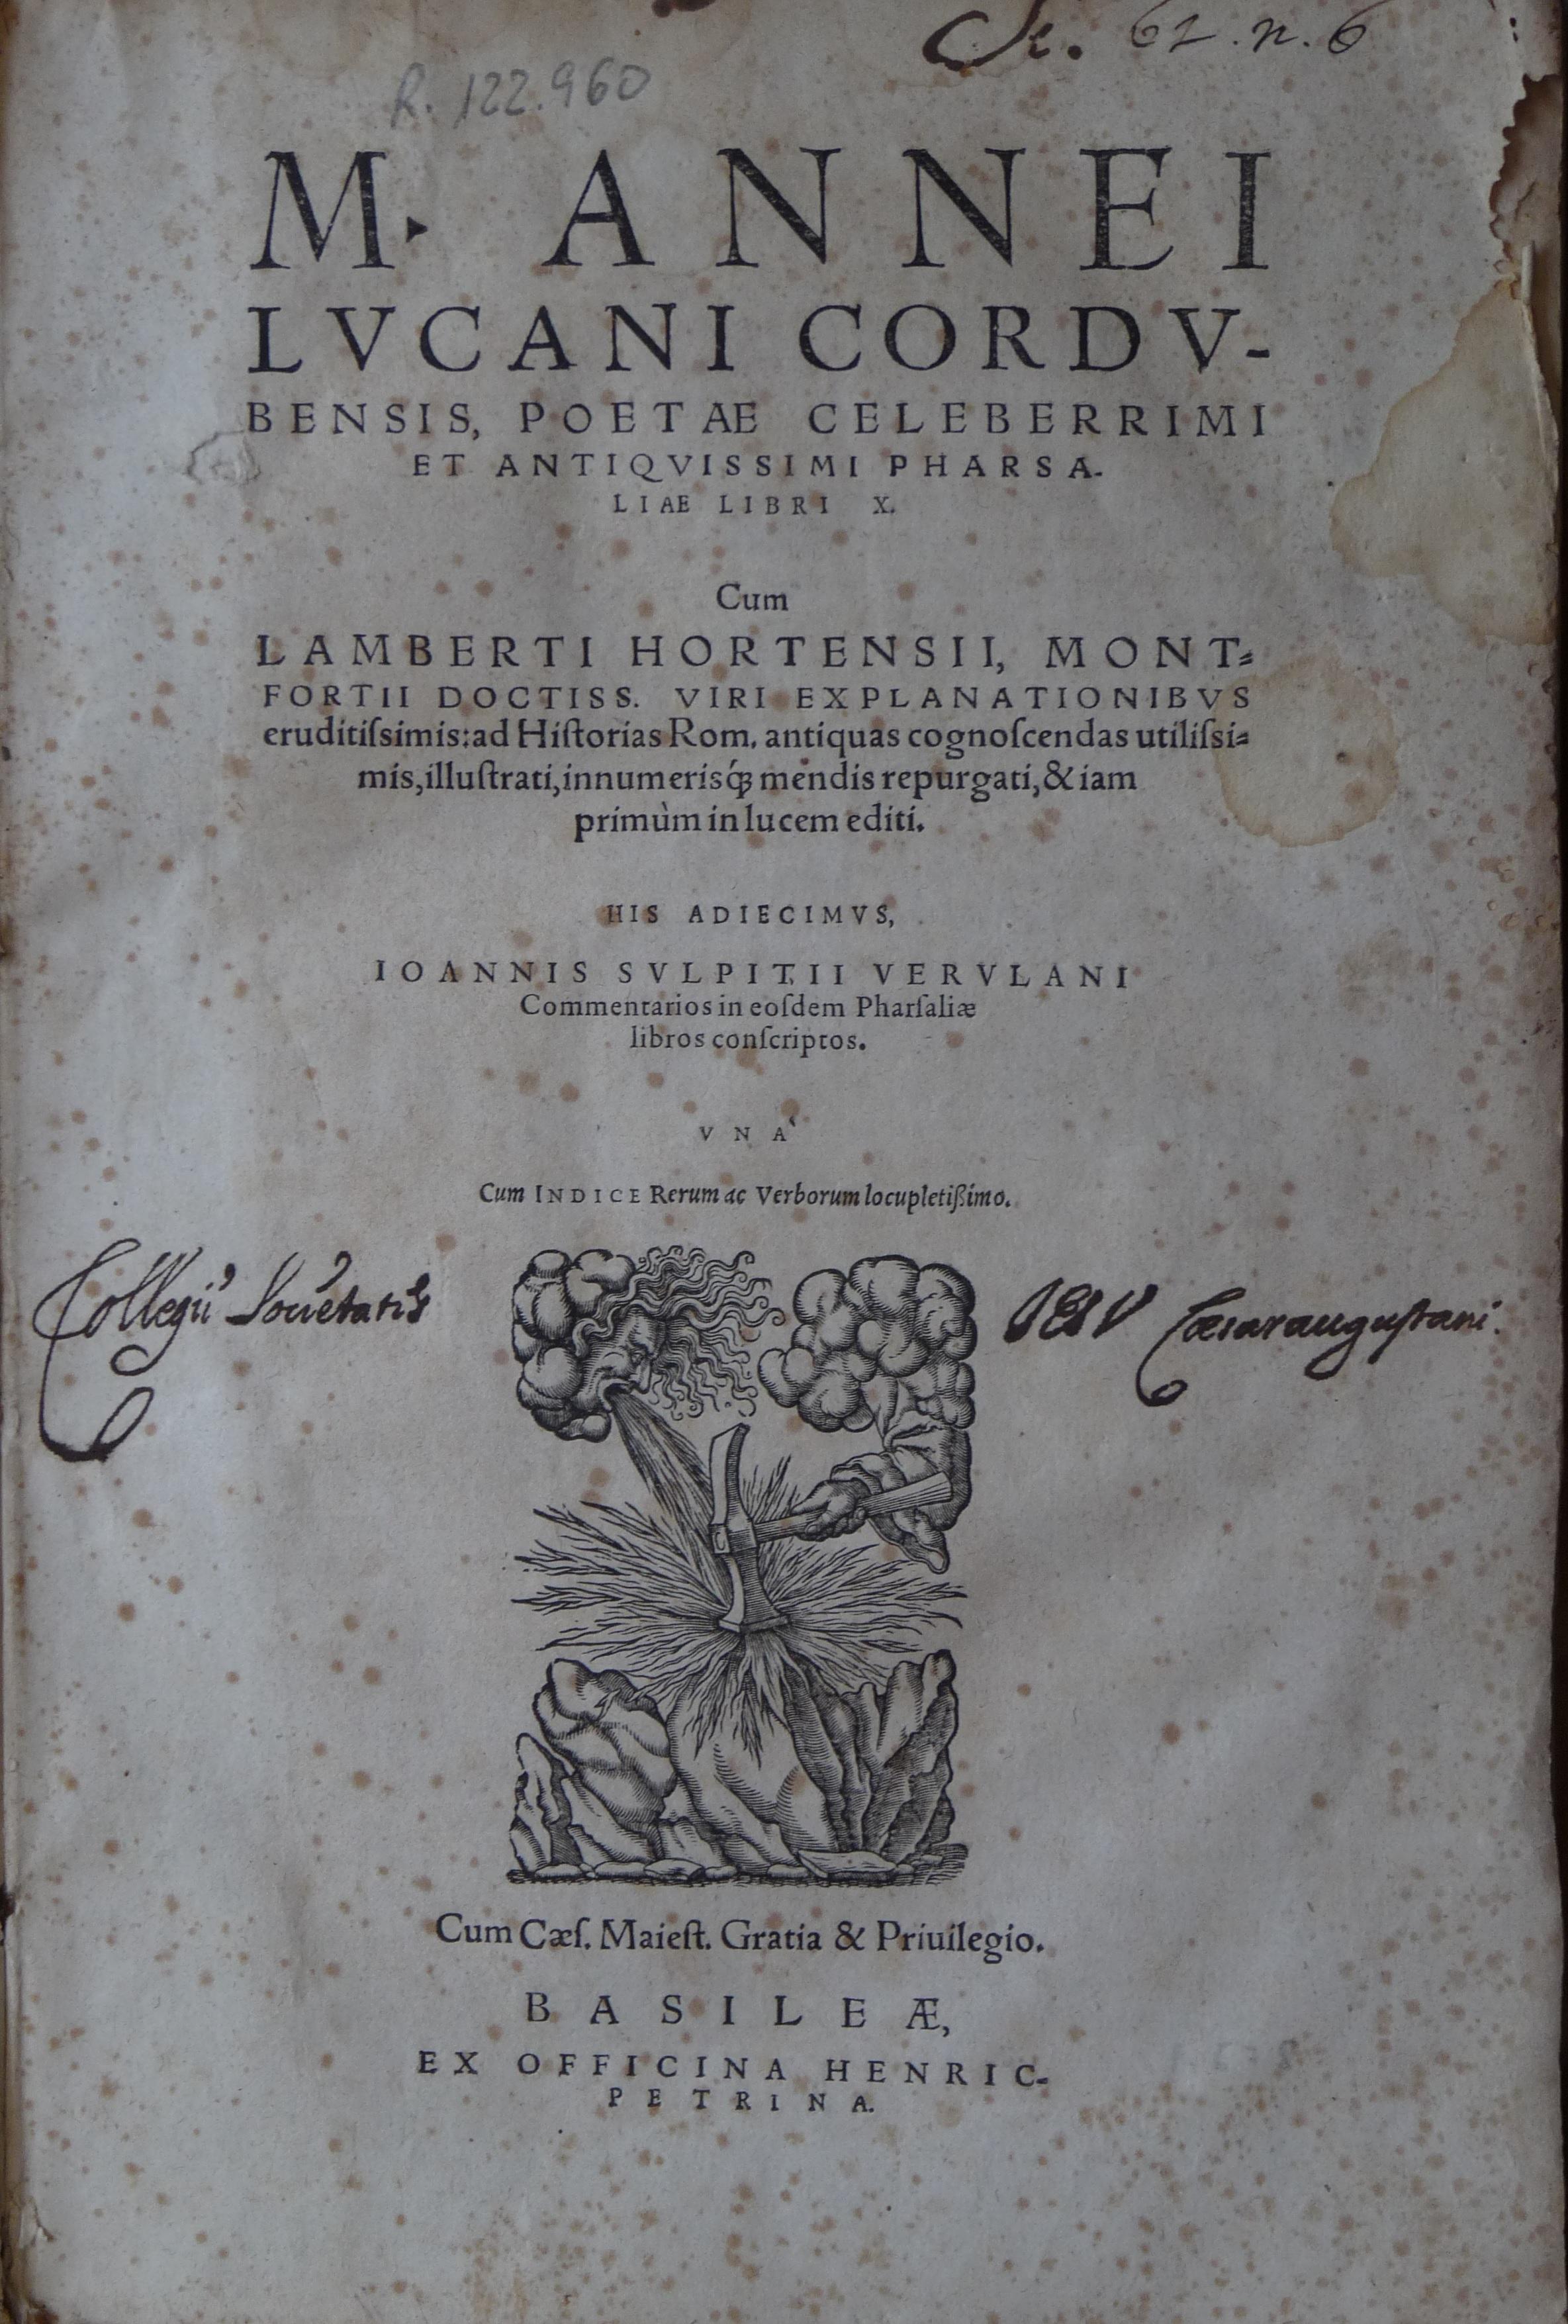 Pharsaliae libri X, 1578